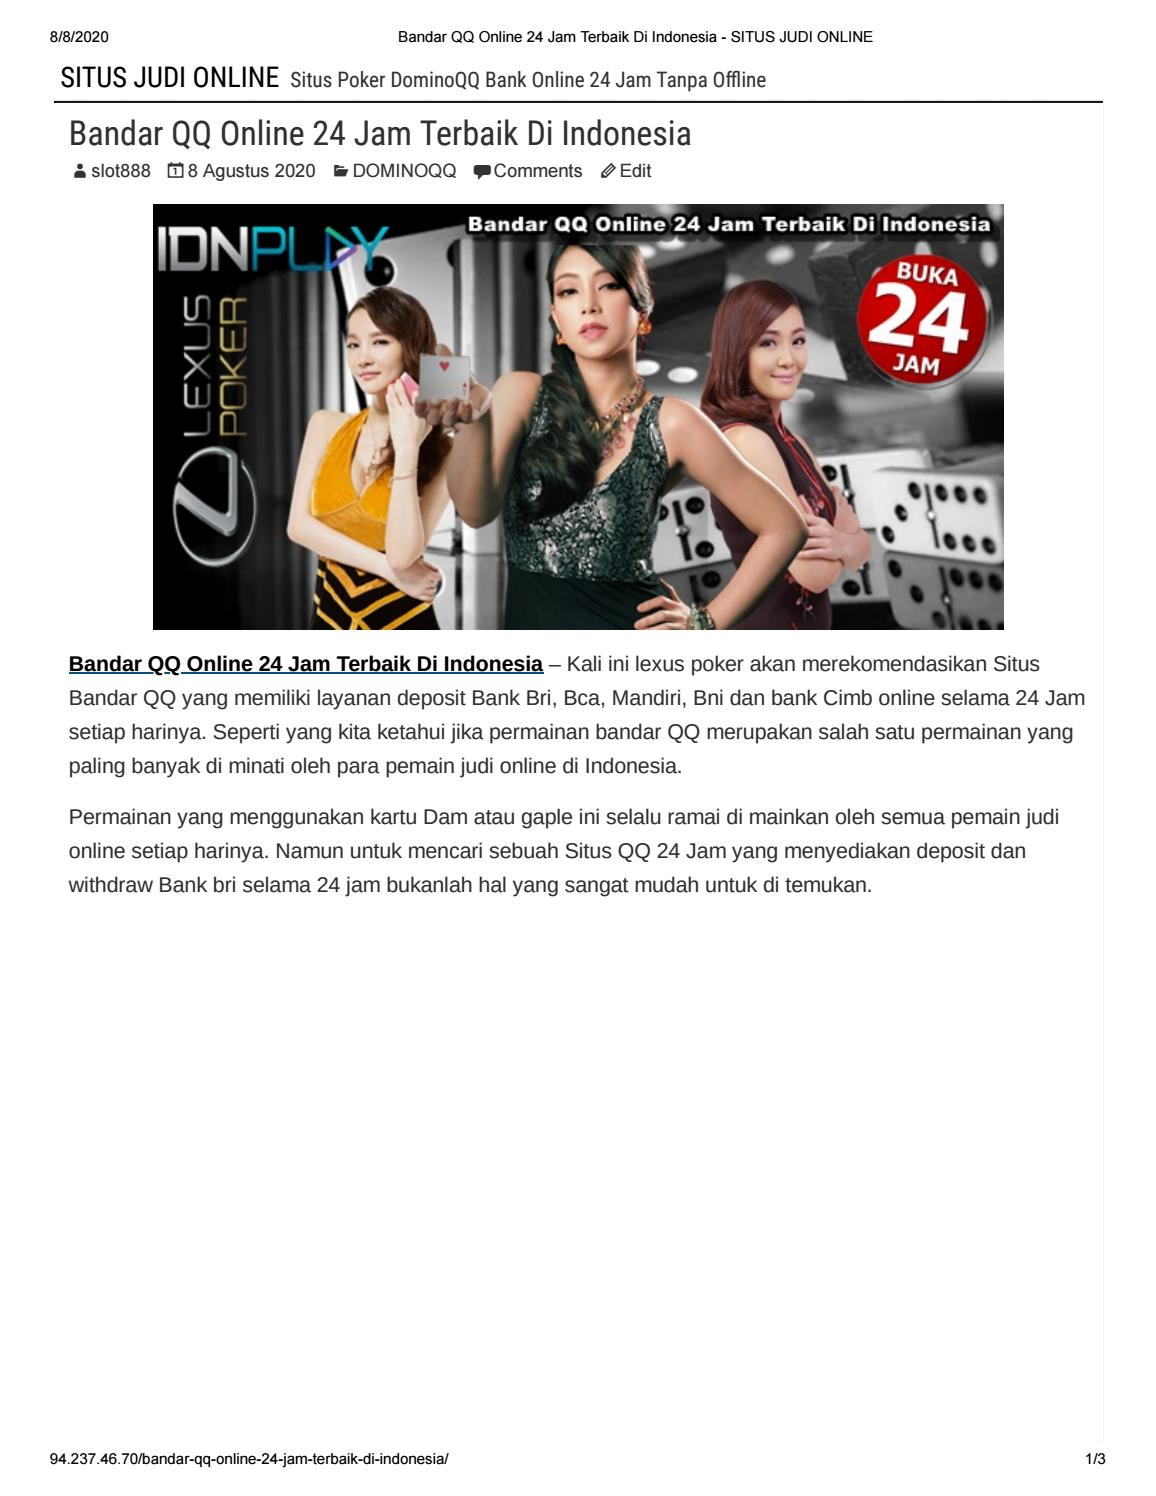 Lexus Poker Bandar Qq Online 24 Jam Terbaik Di Indonesia By Sakurapoker Issuu